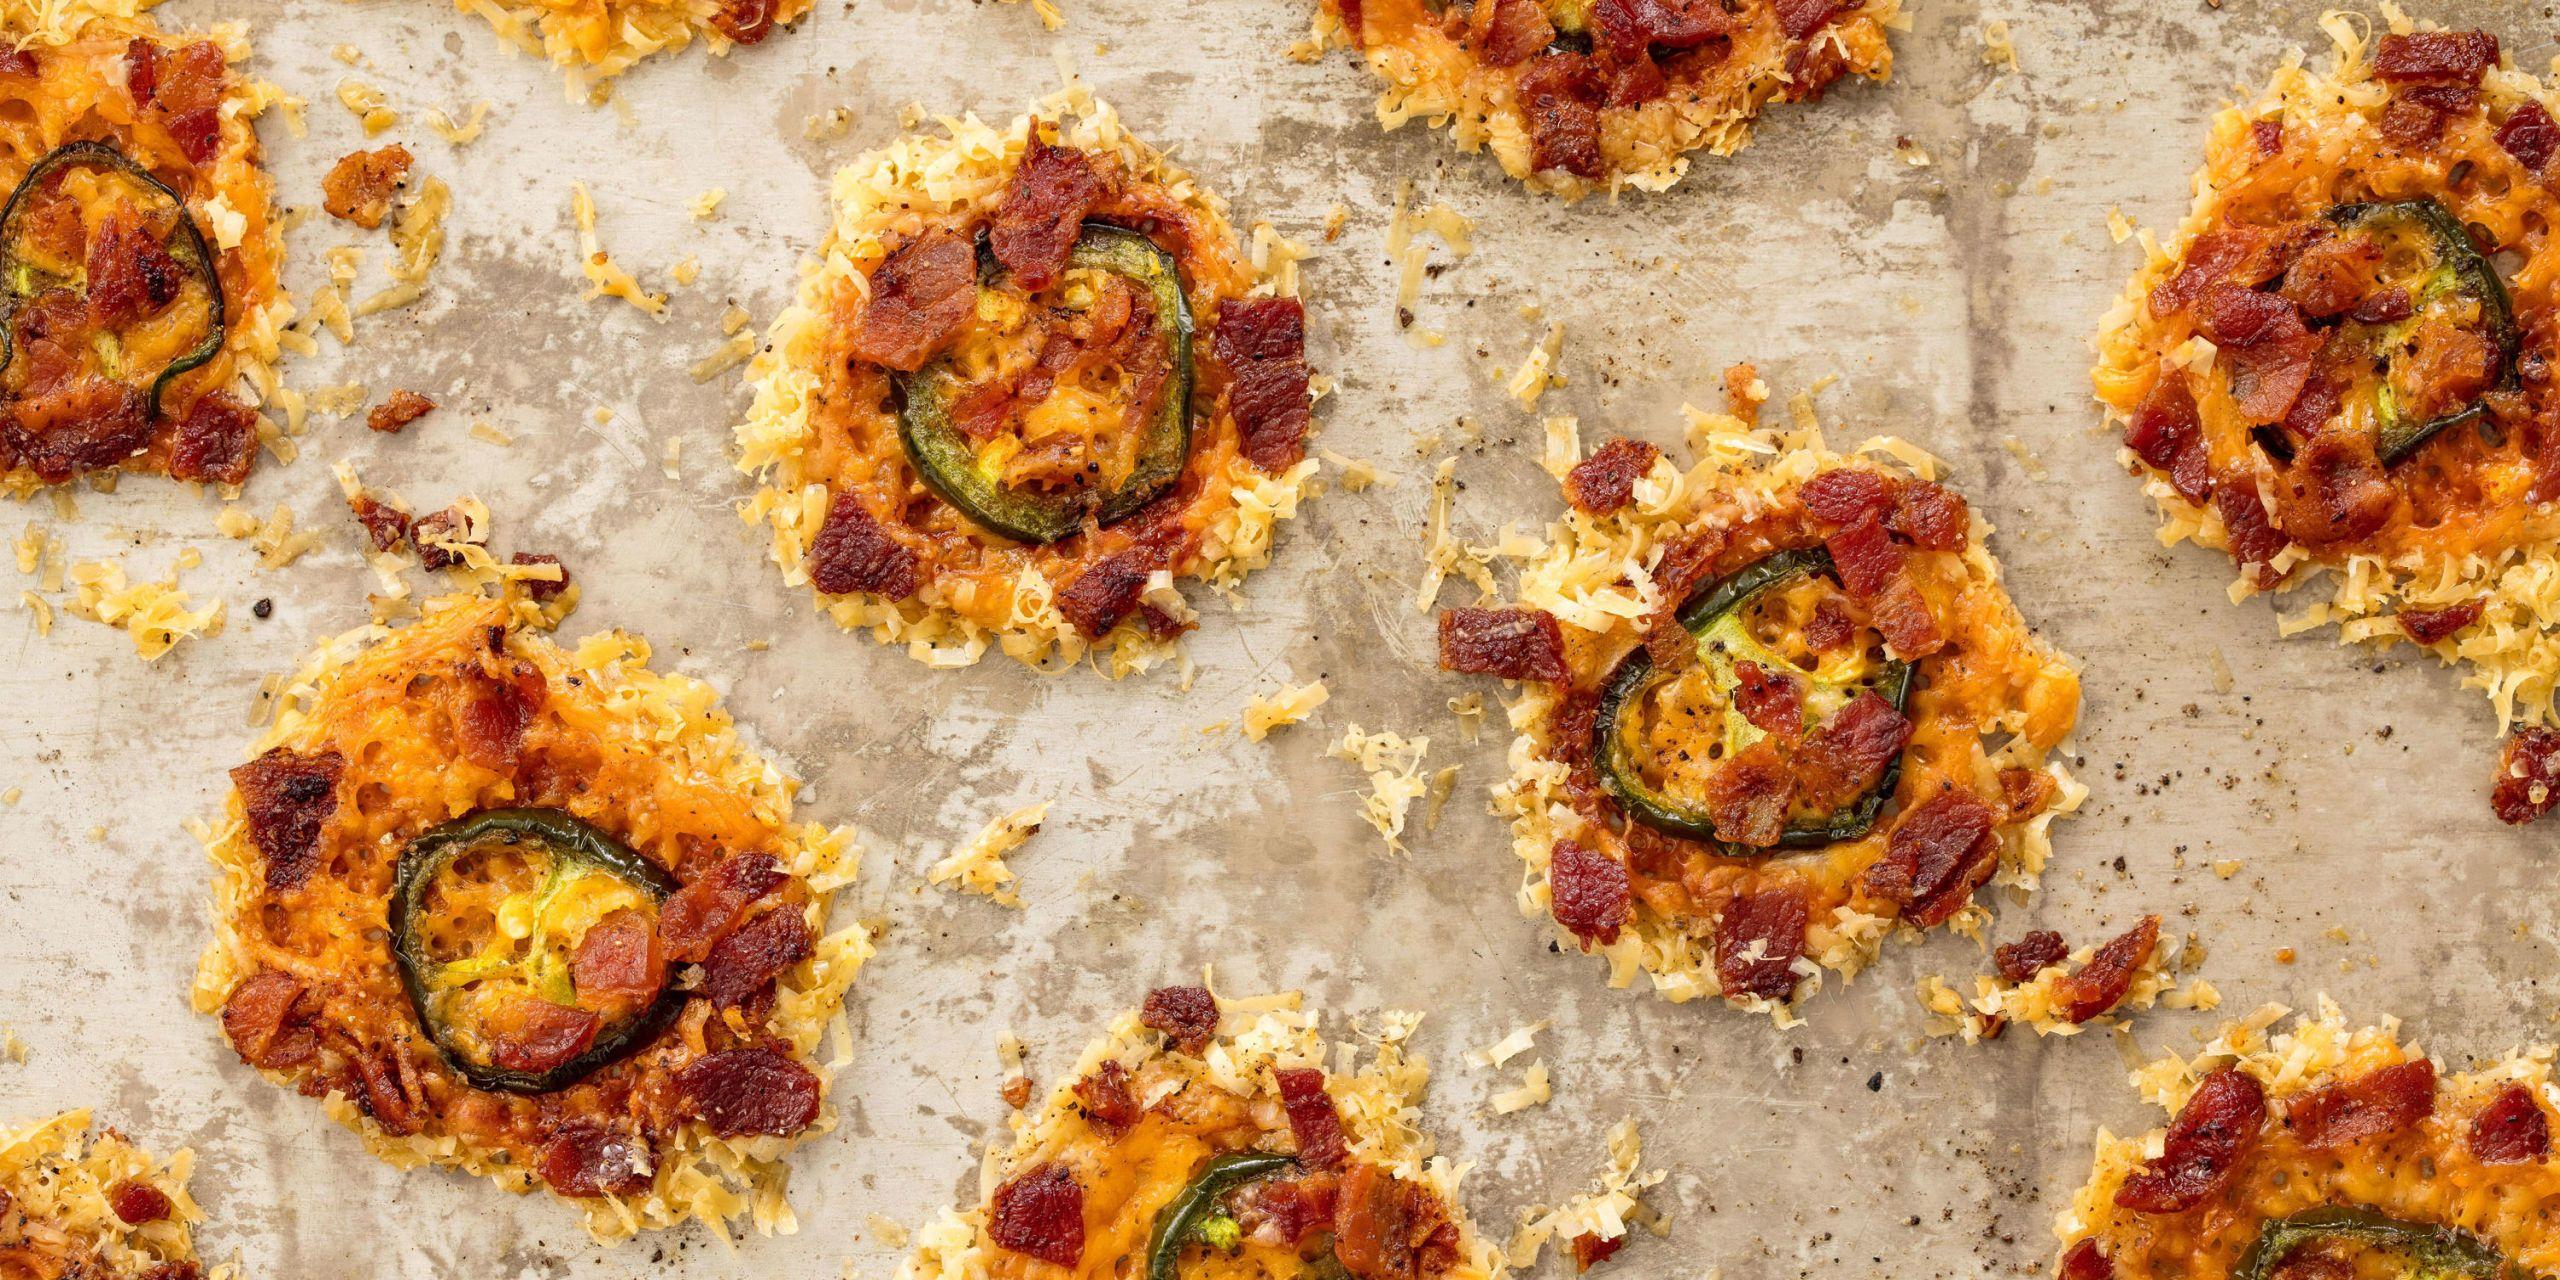 66 Super Simple Last-Minute Appetizers